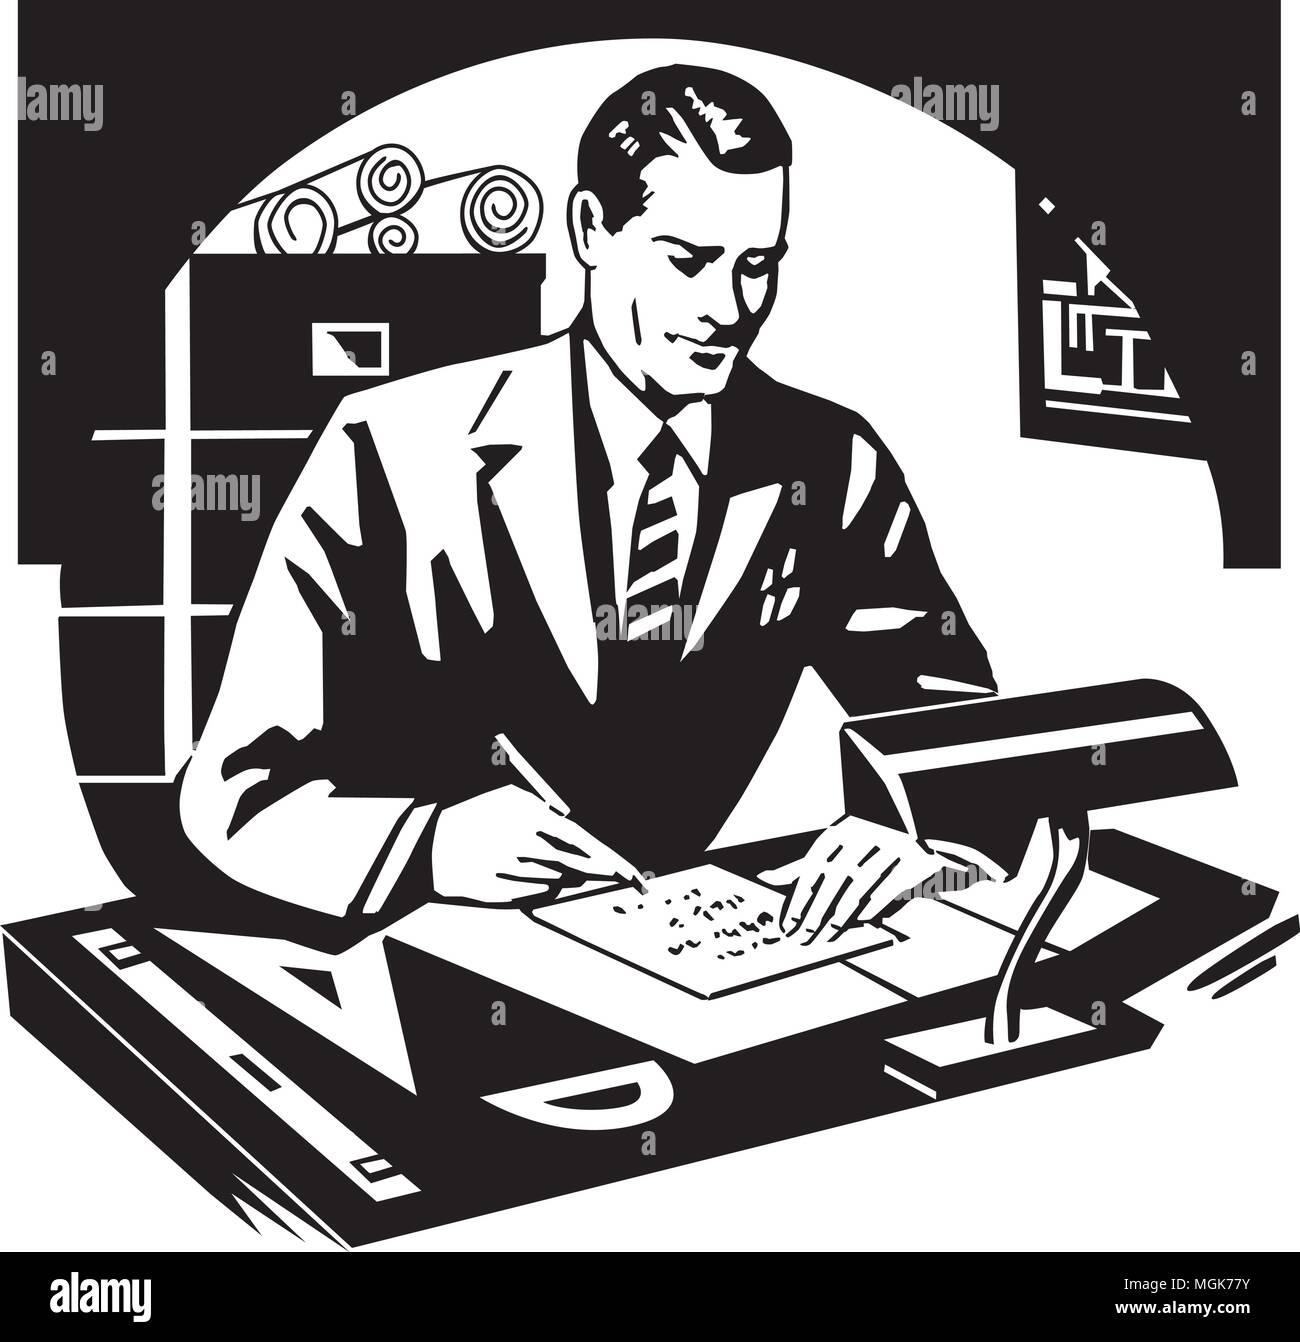 Success With Mathematics - Retro Ad Art Illustration - Stock Image